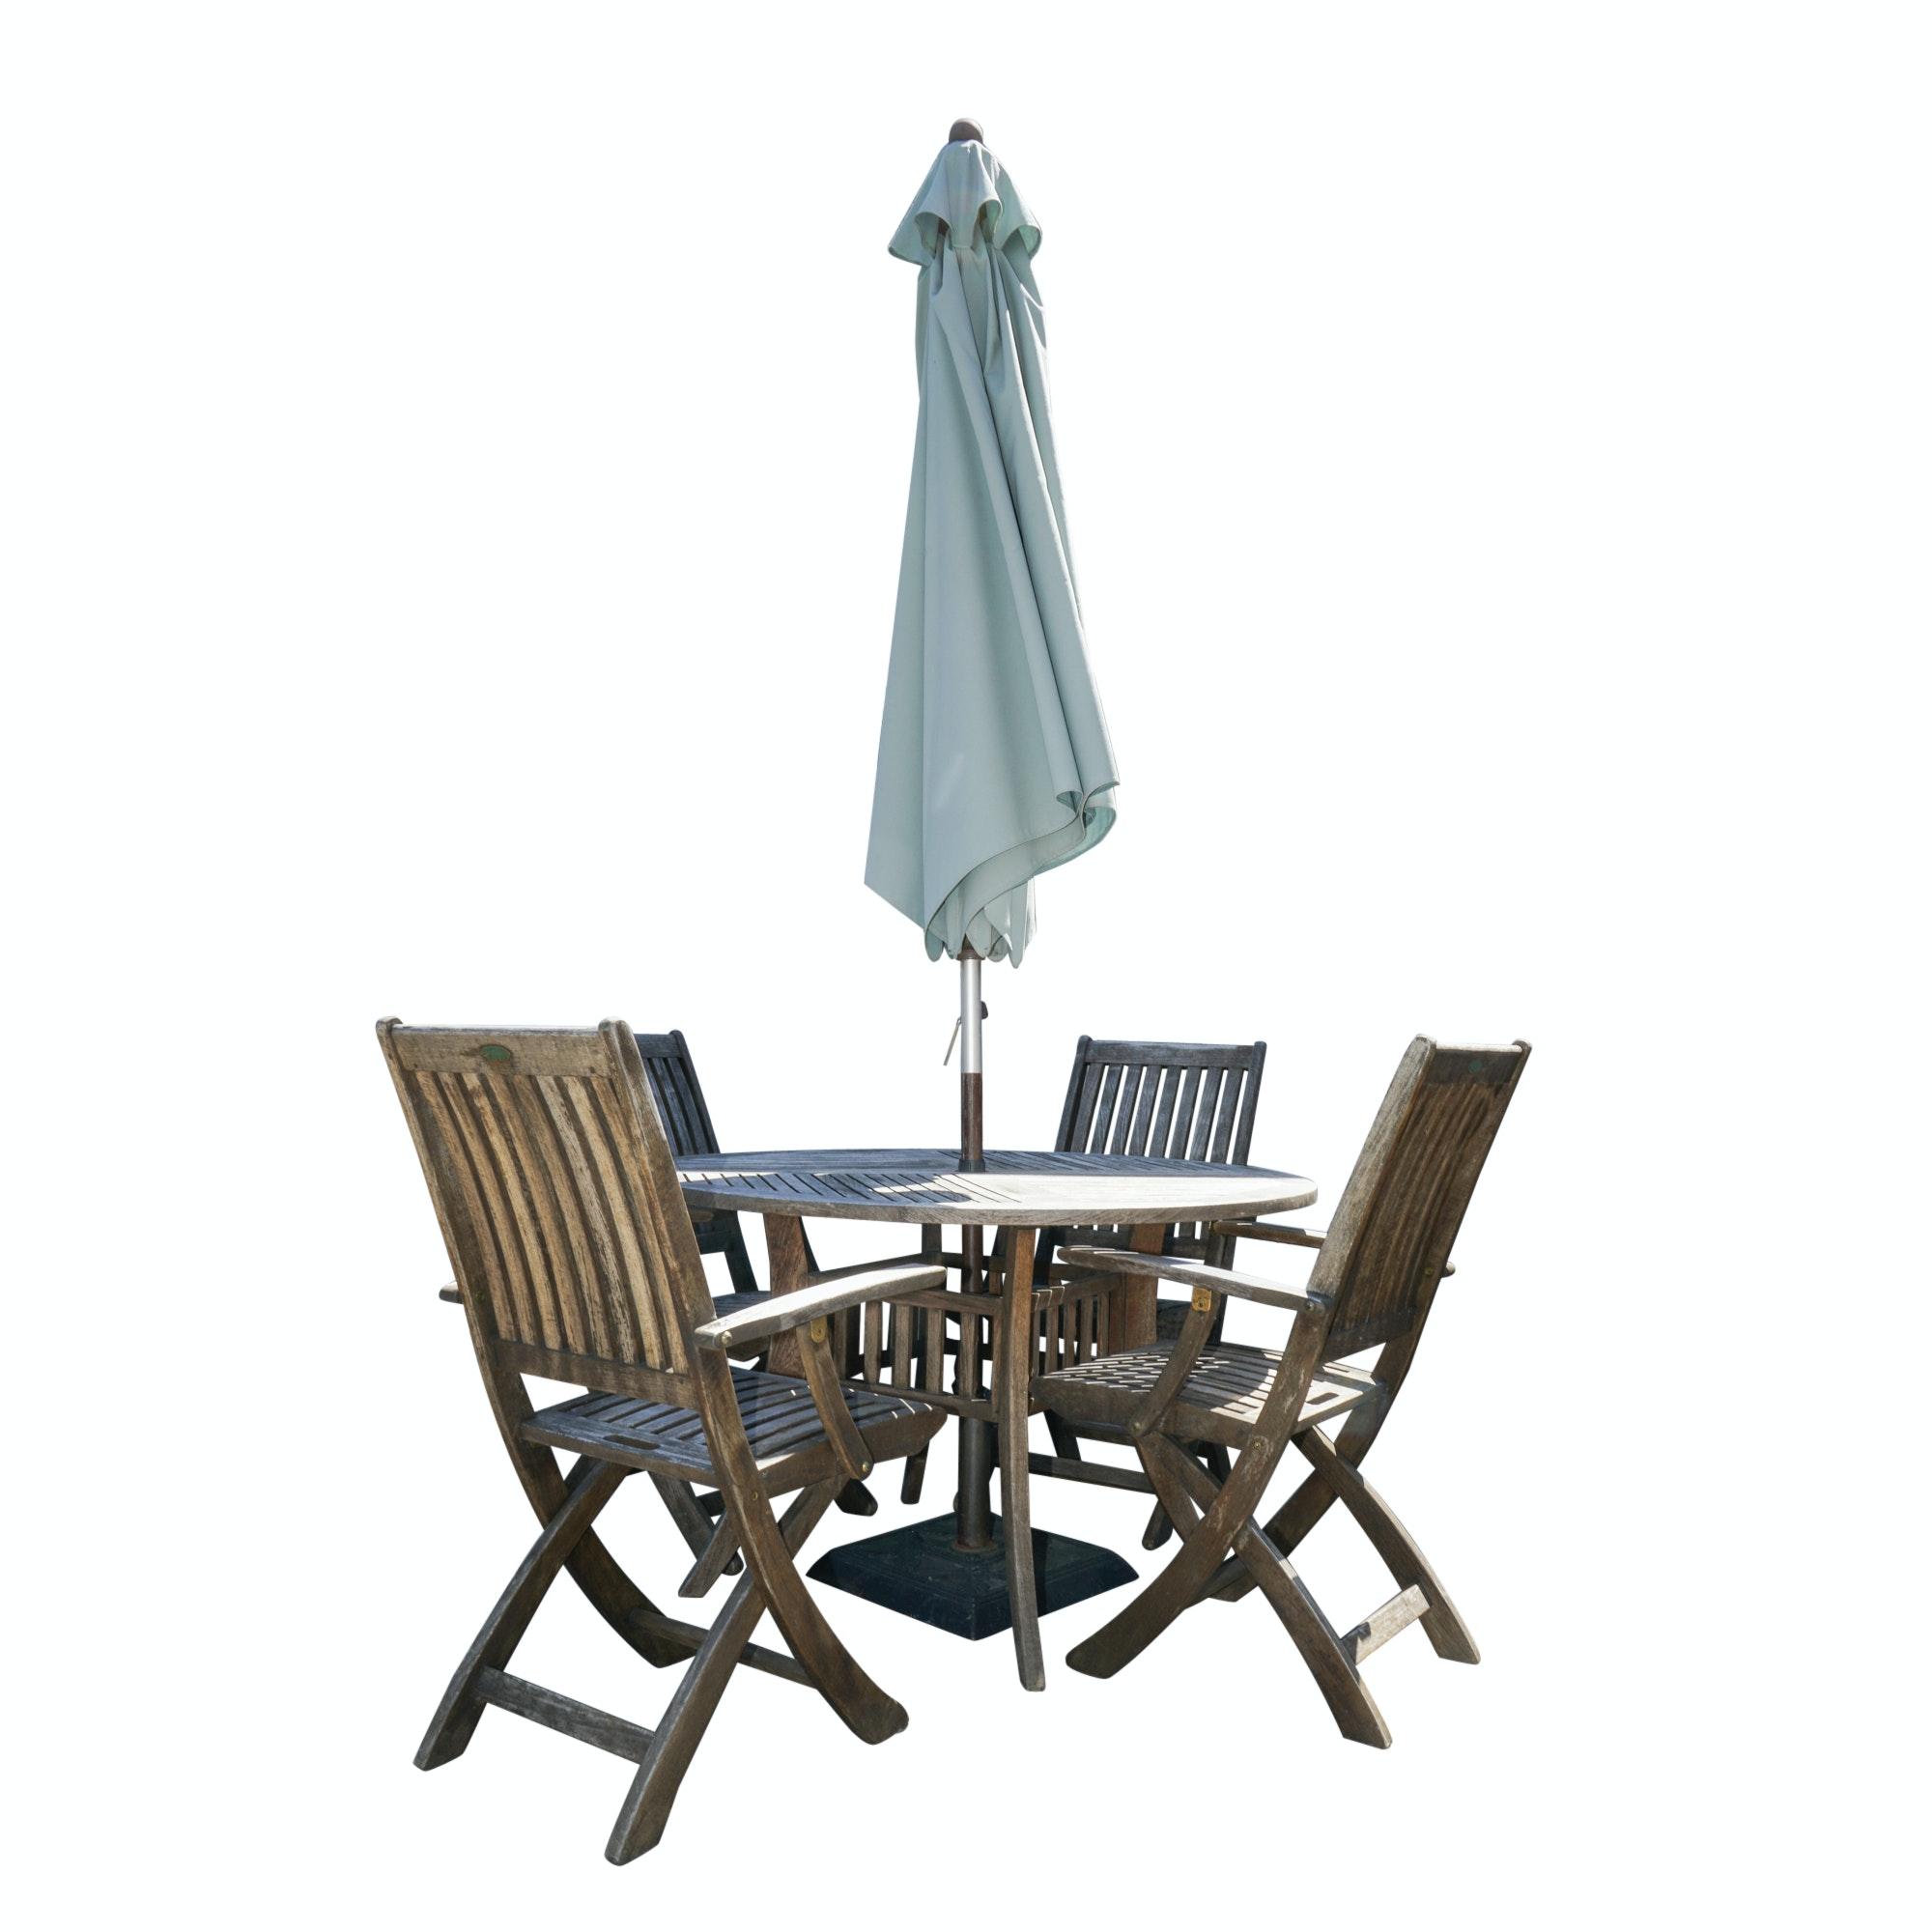 Westminster Teak Patio Furniture Set